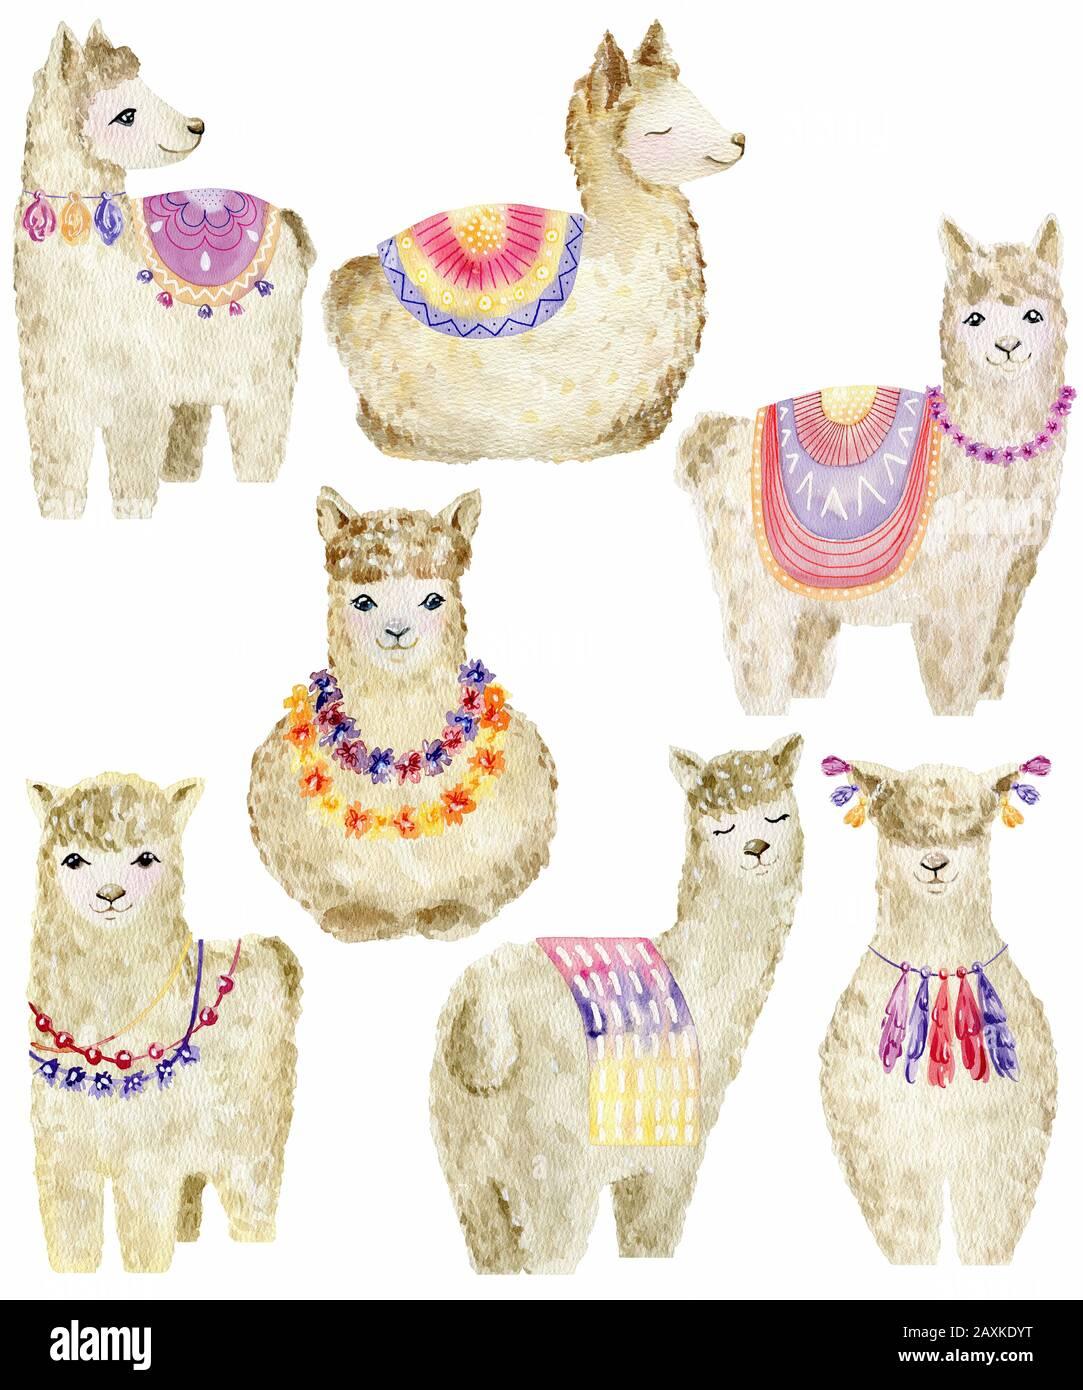 Alpaca//llama family decal set in 9 colors